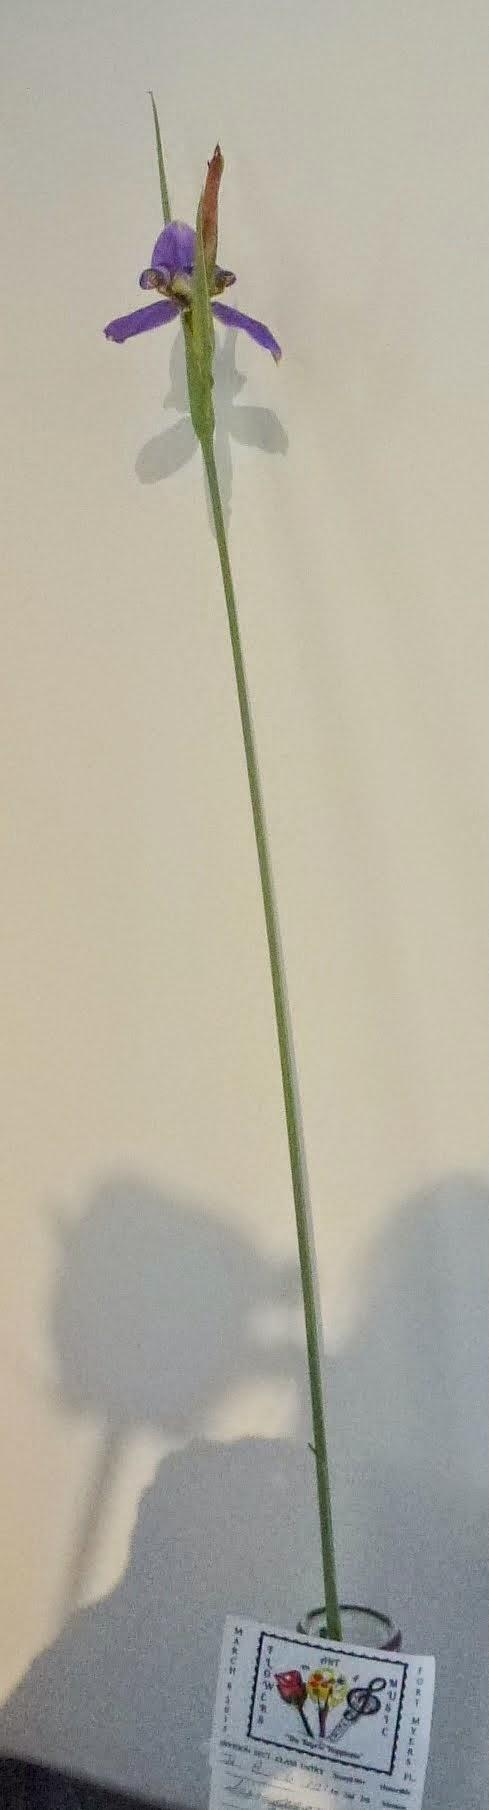 P1140622.JPG